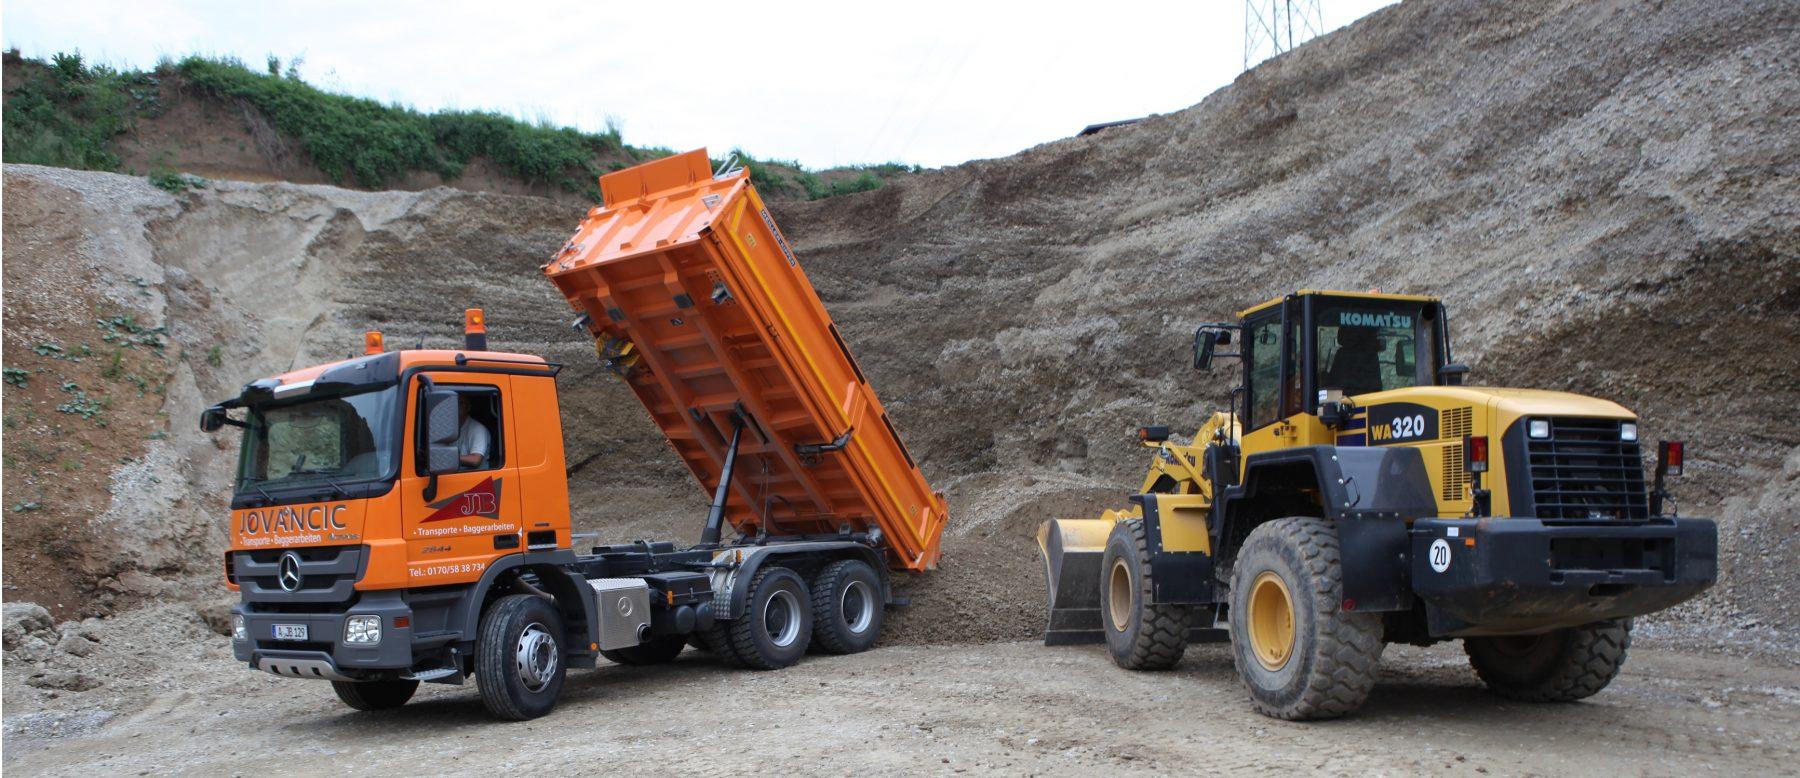 JOVANCIC Transporte & Baggerarbeiten